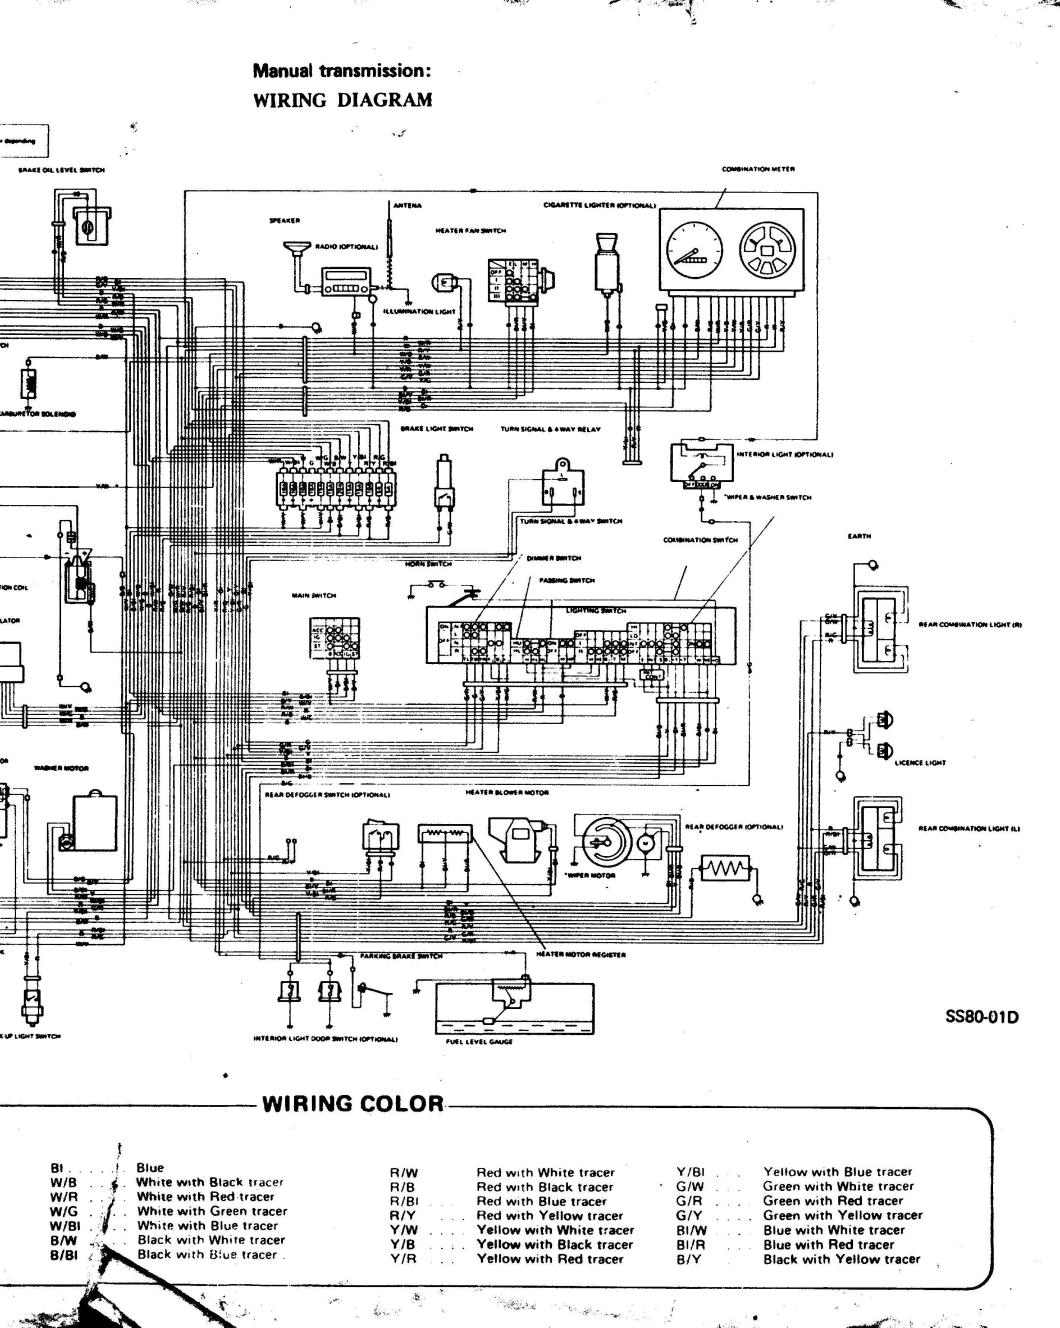 Maruti wagon r spare parts catalogue pdf motorview maruti car manuals wiring diagrams pdf fault codes cheapraybanclubmaster Choice Image